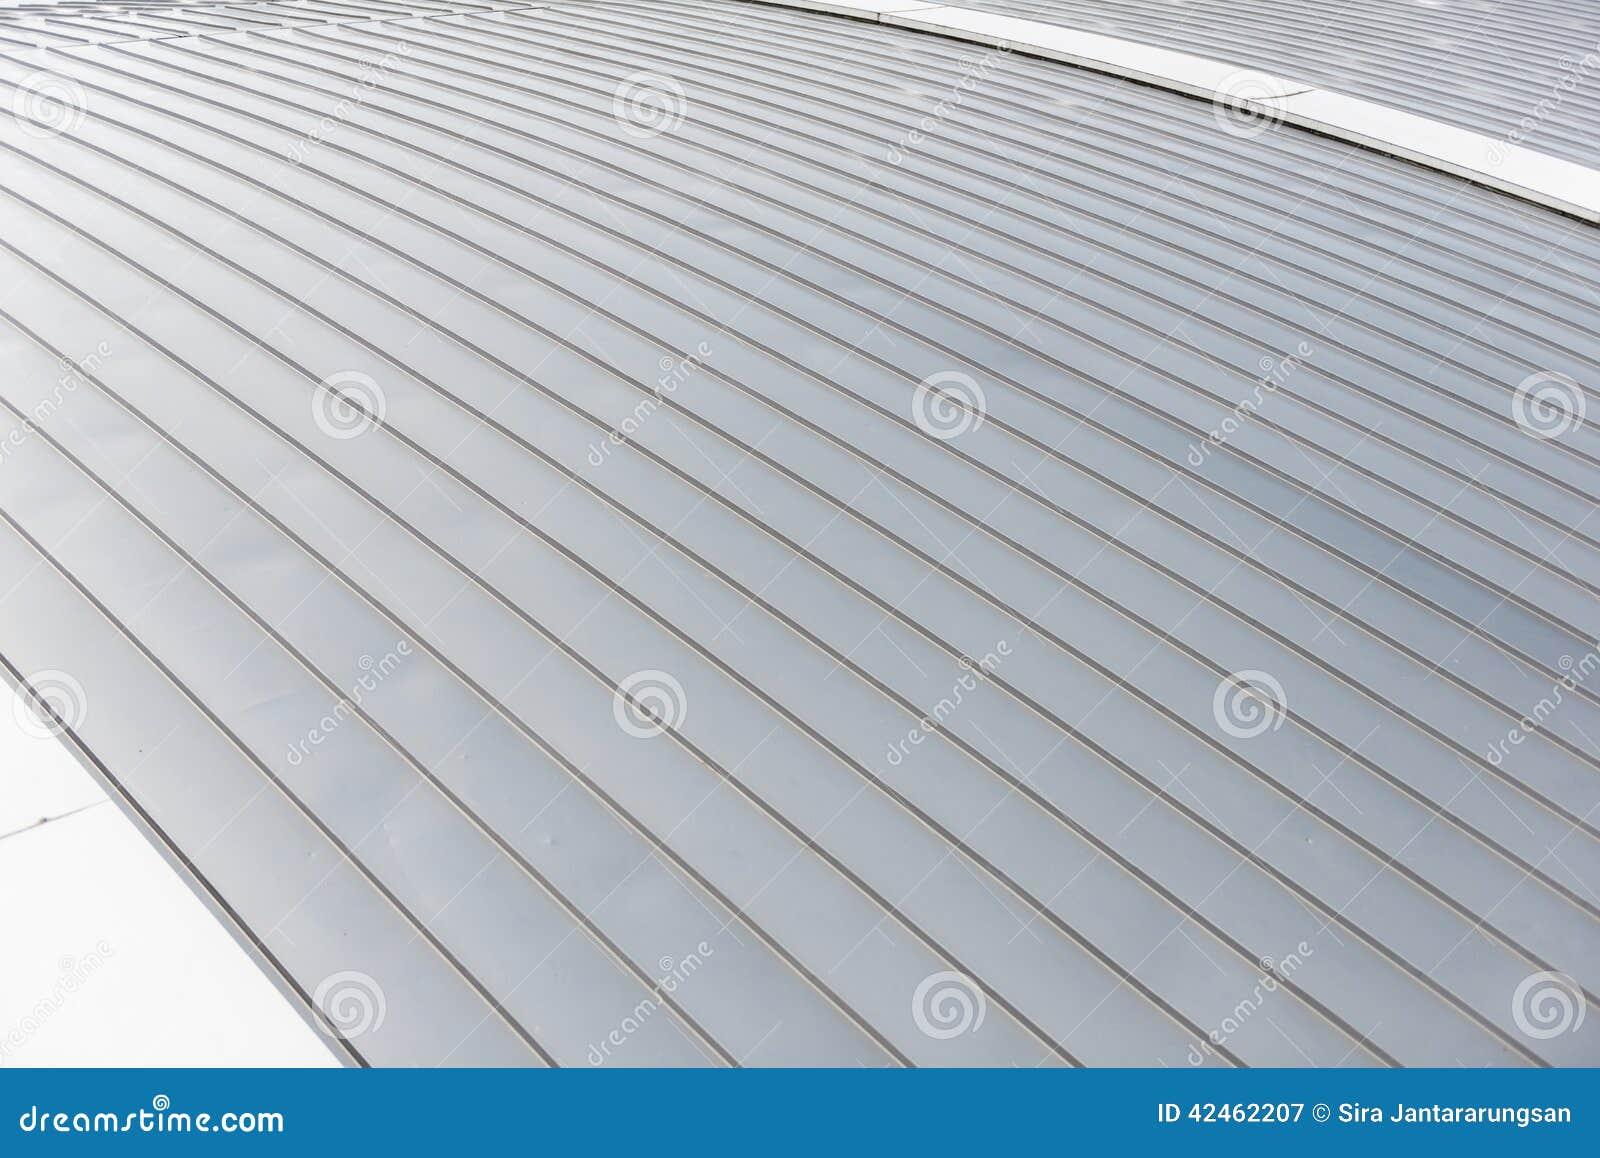 Aluminiumblattdachhintergrund